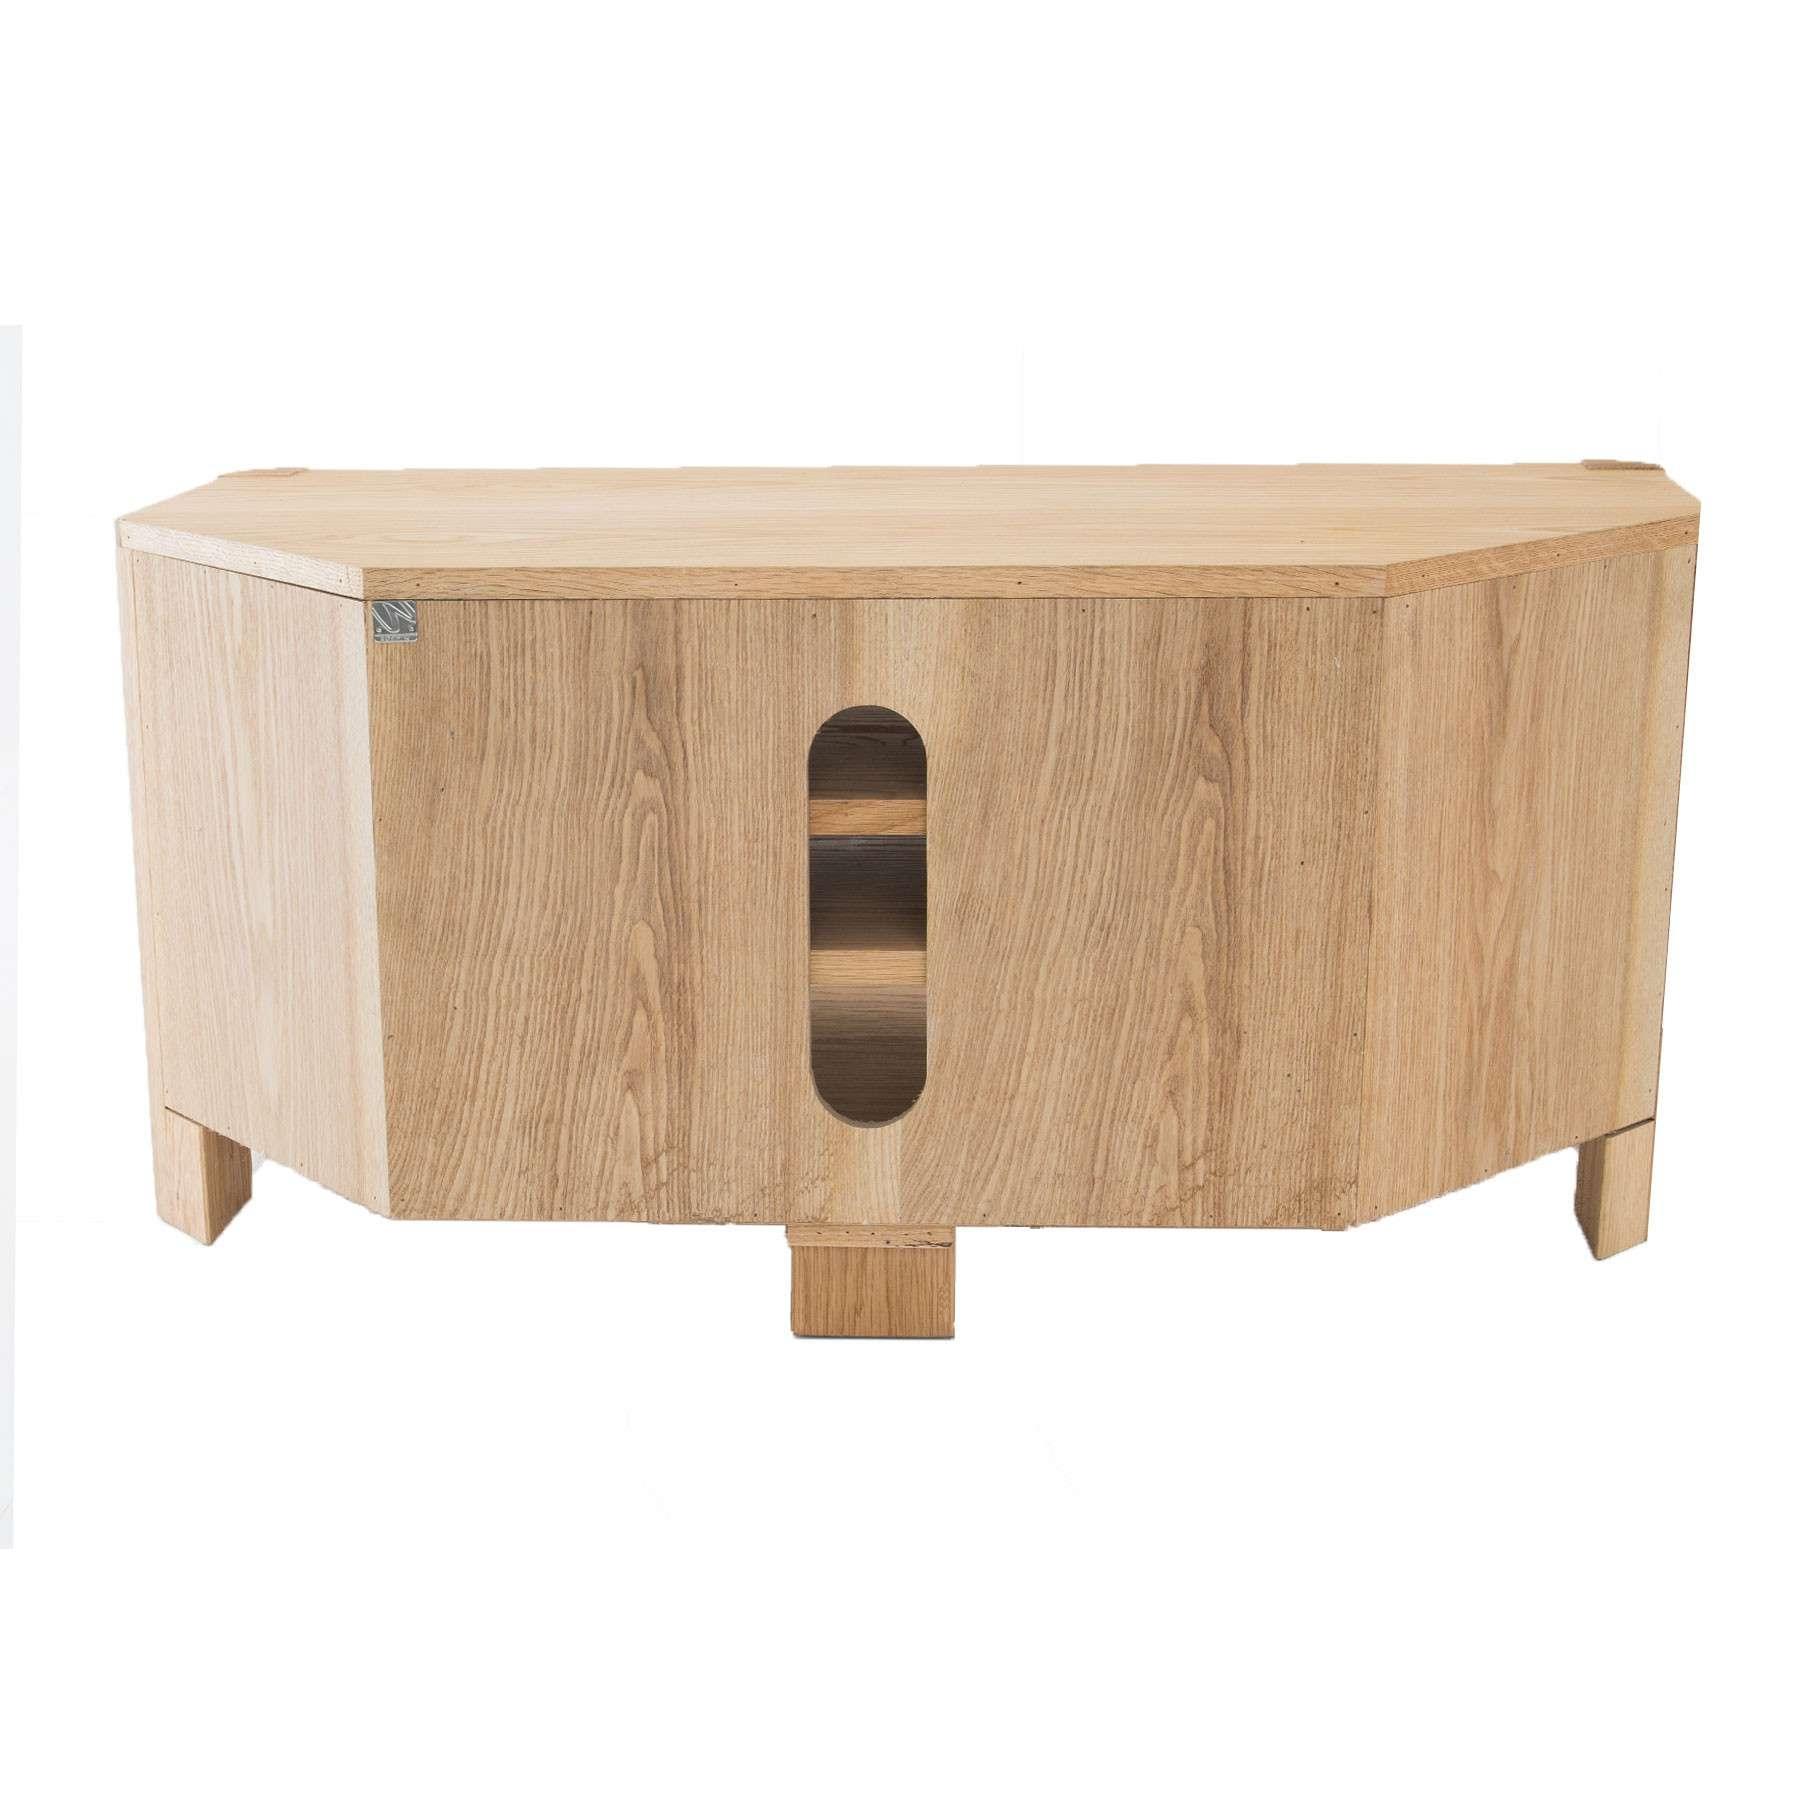 "Oslo Light Oak Corner Tv Stand For Up To 44"" Tvs Regarding Light Oak Corner Tv Cabinets (View 12 of 20)"